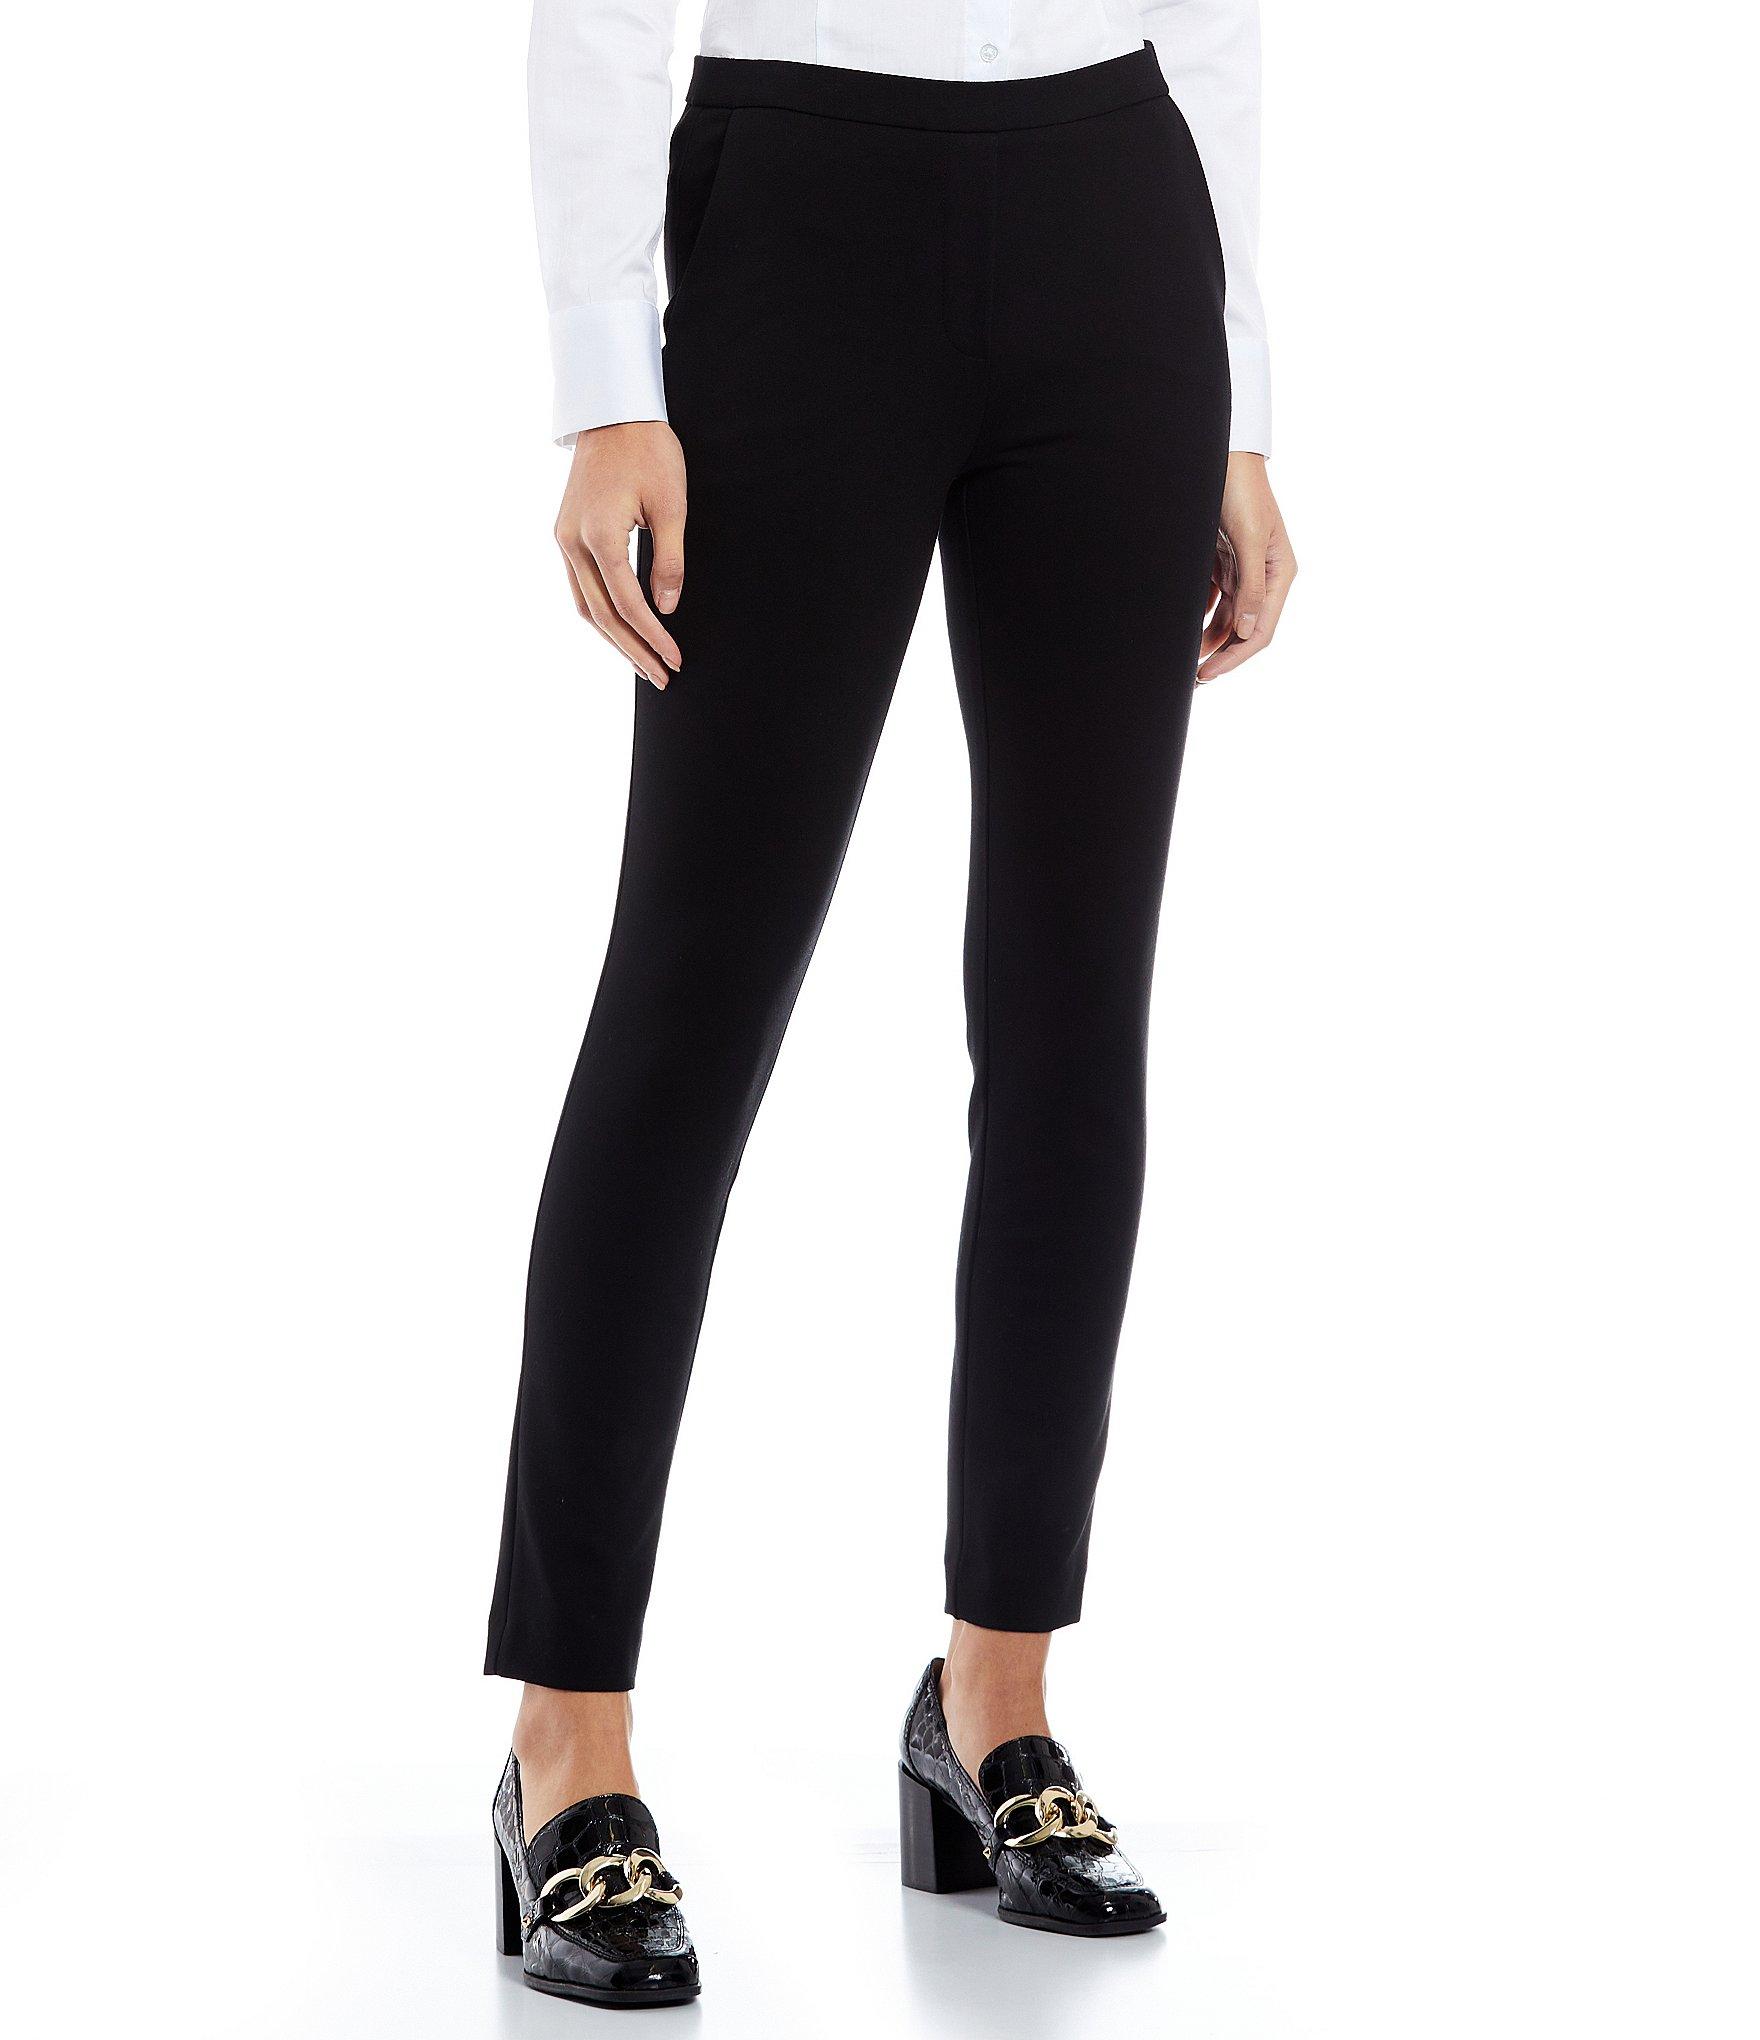 Antonio Melani Women S Casual Dress Pants Dillard S